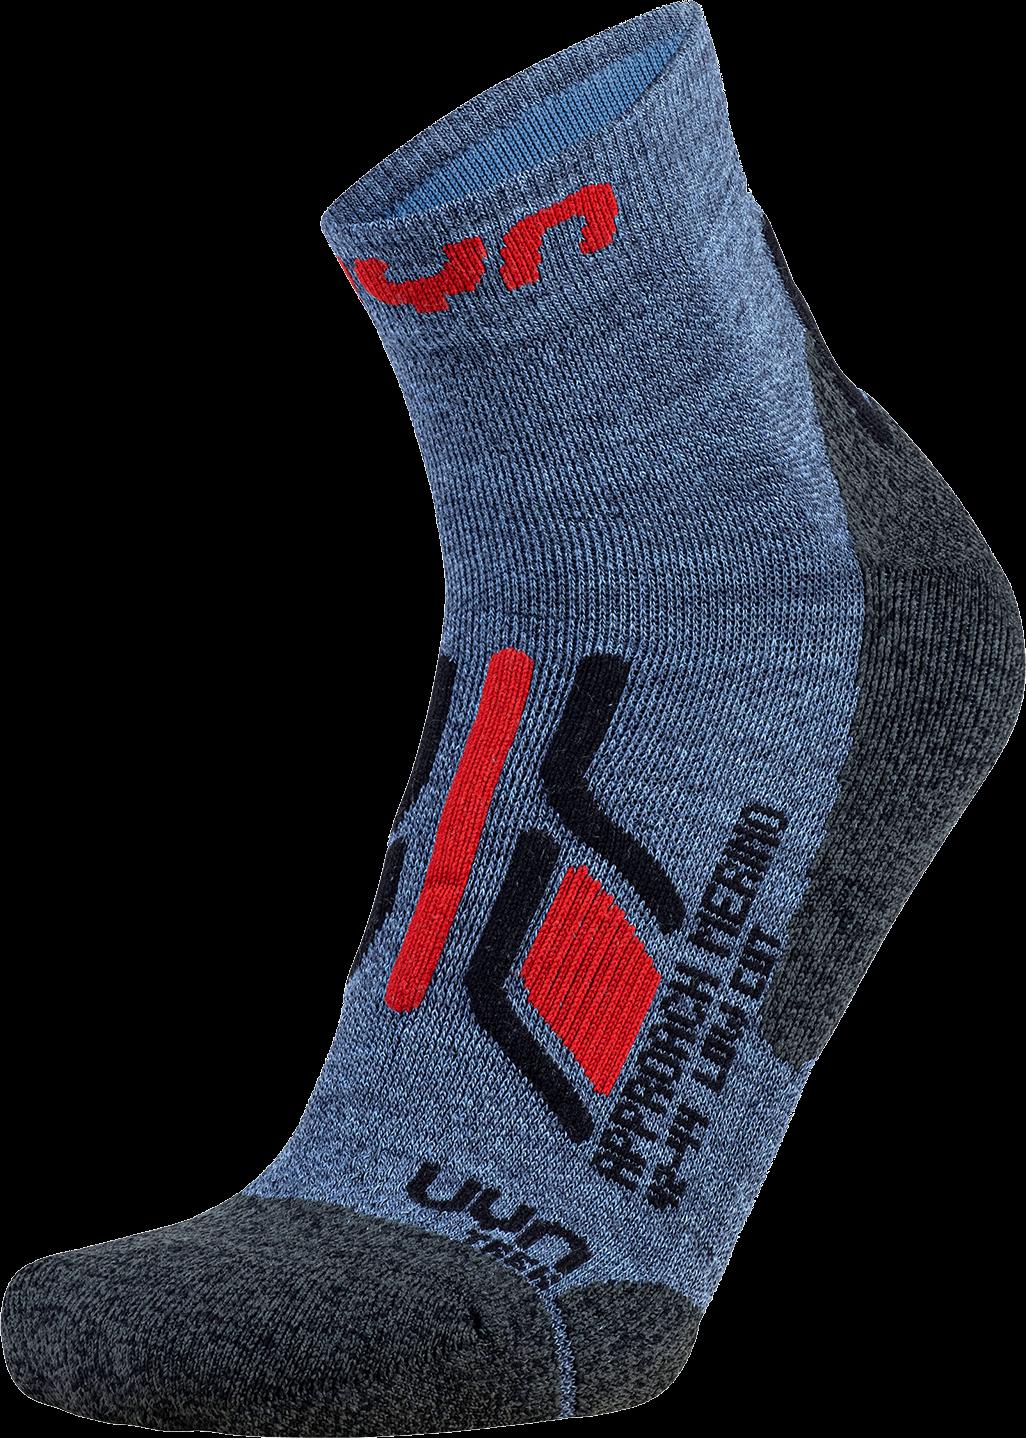 UYN ponožky T MAN TREKKING APPROACH MERINO LOW CUT SOCKS jeans/anthracite/red Velikost: 45-47